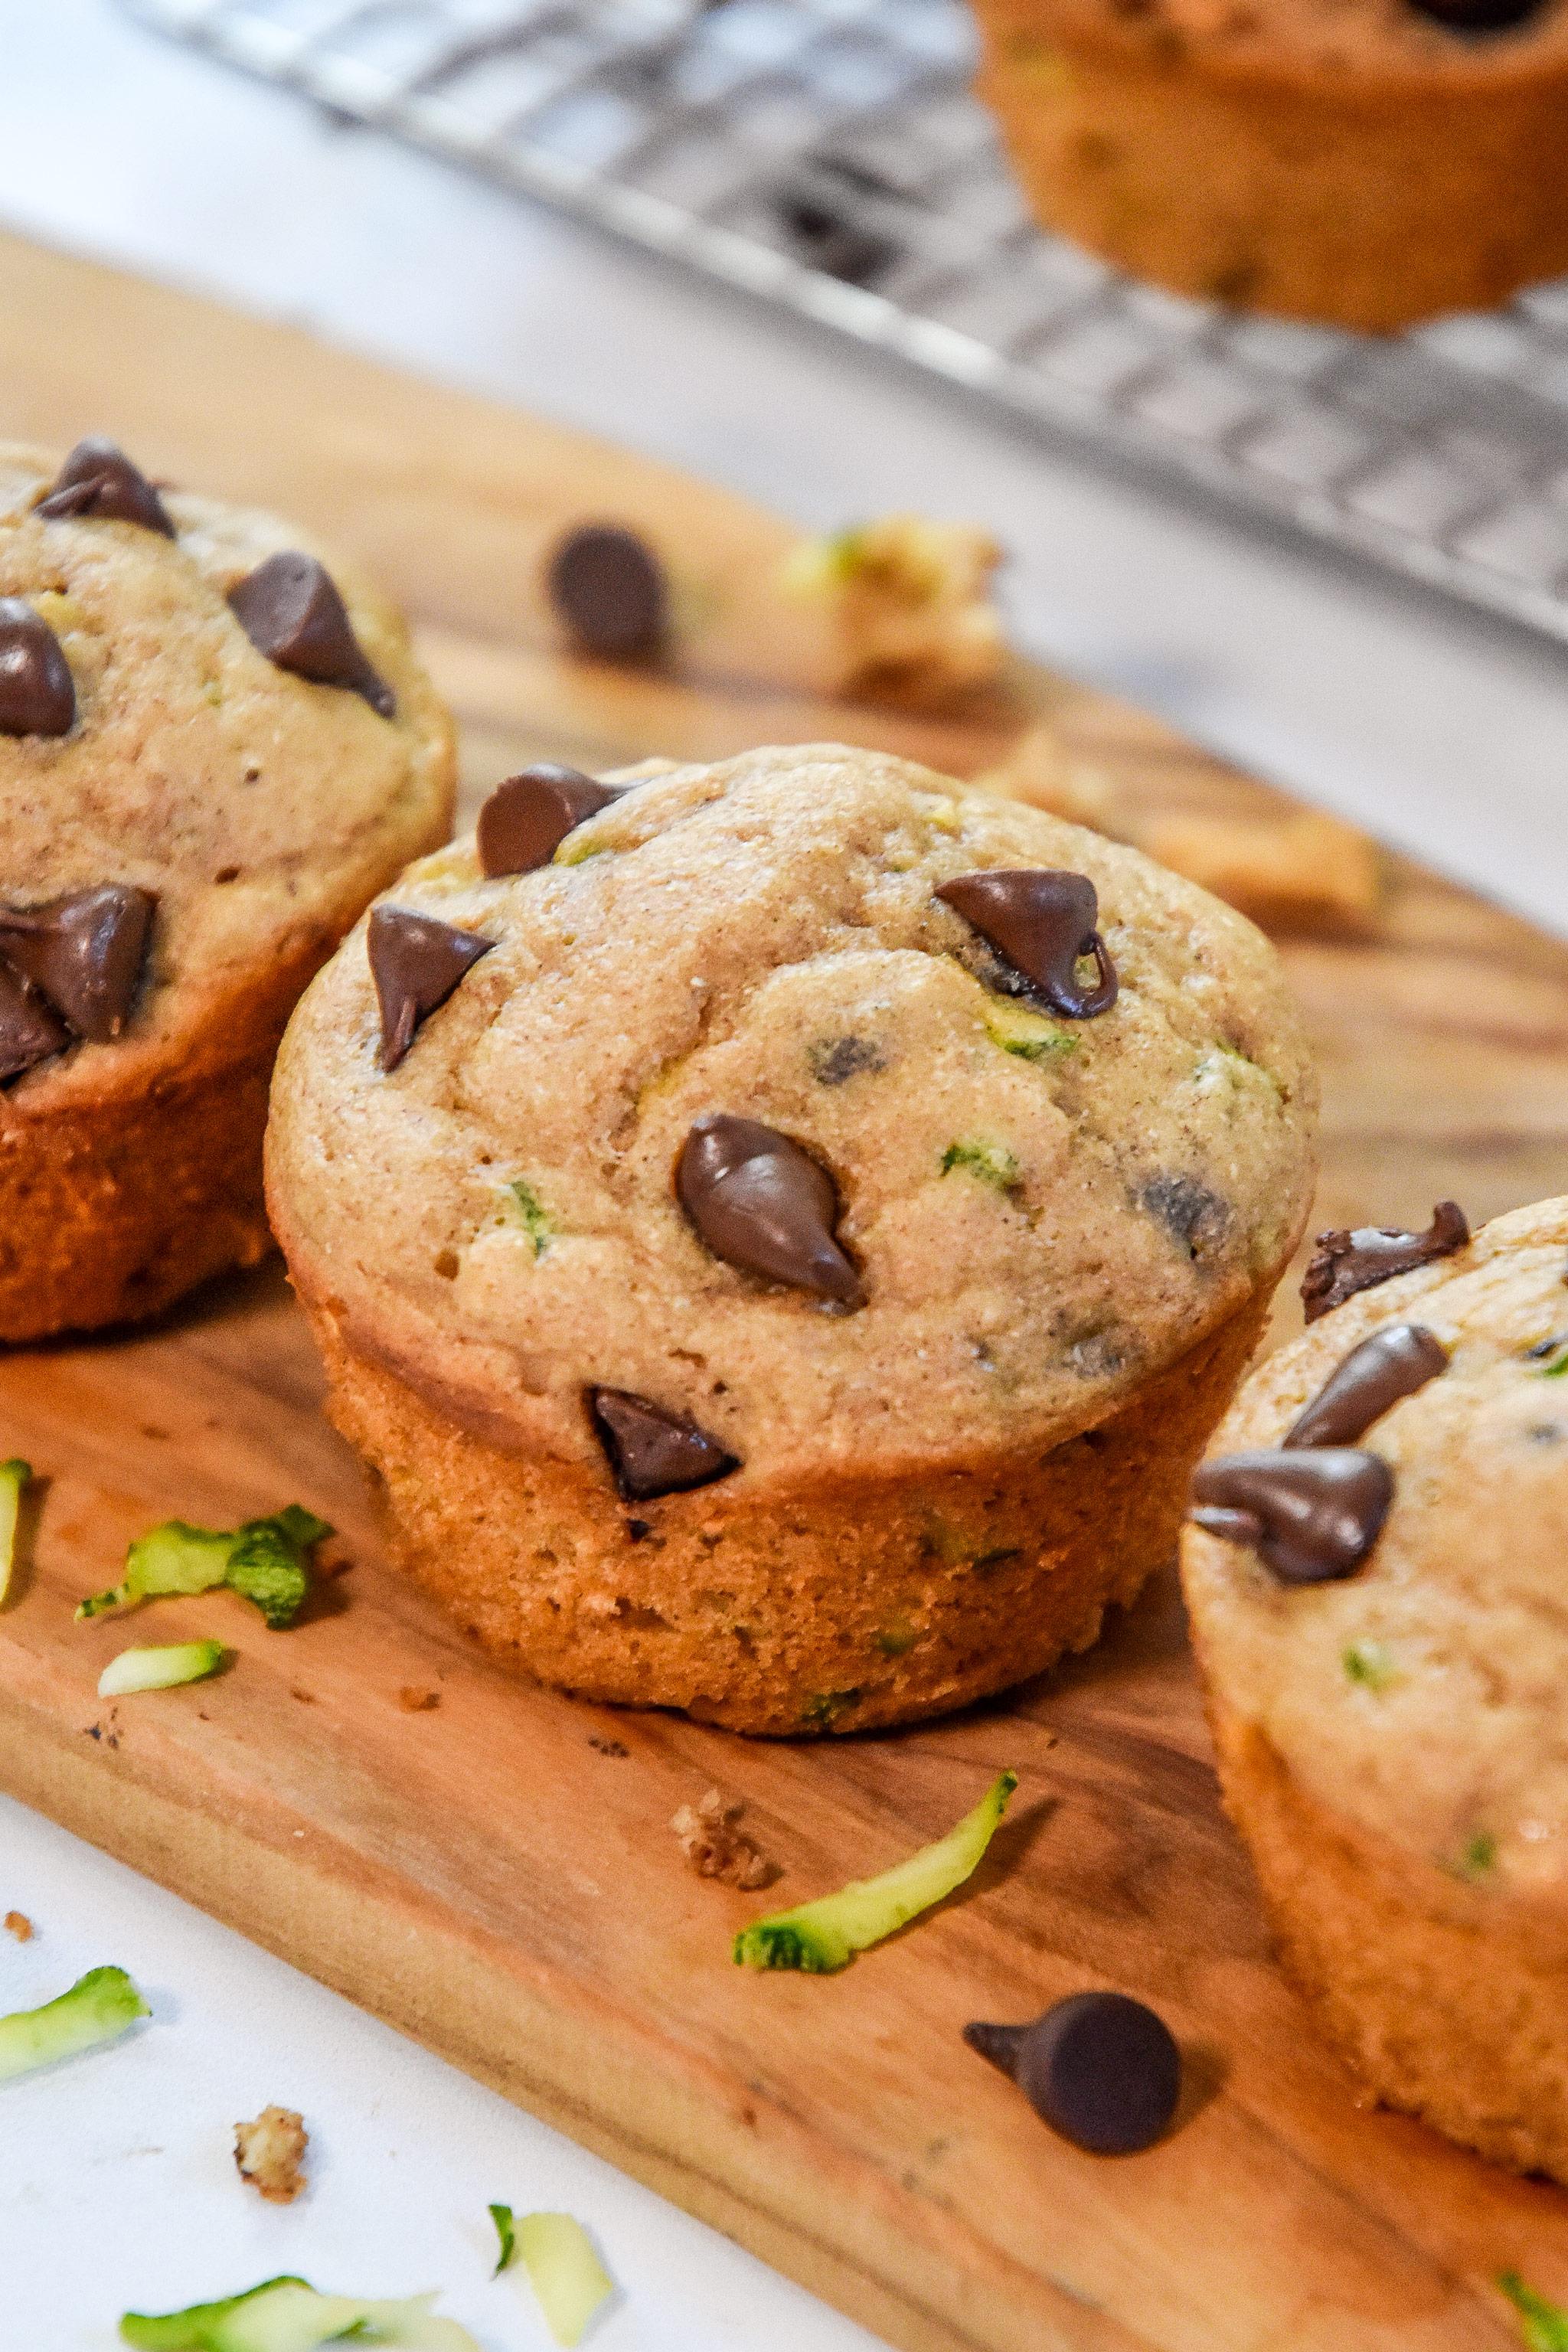 pancake mix zucchini muffins with chocolate chips on a cutting board.